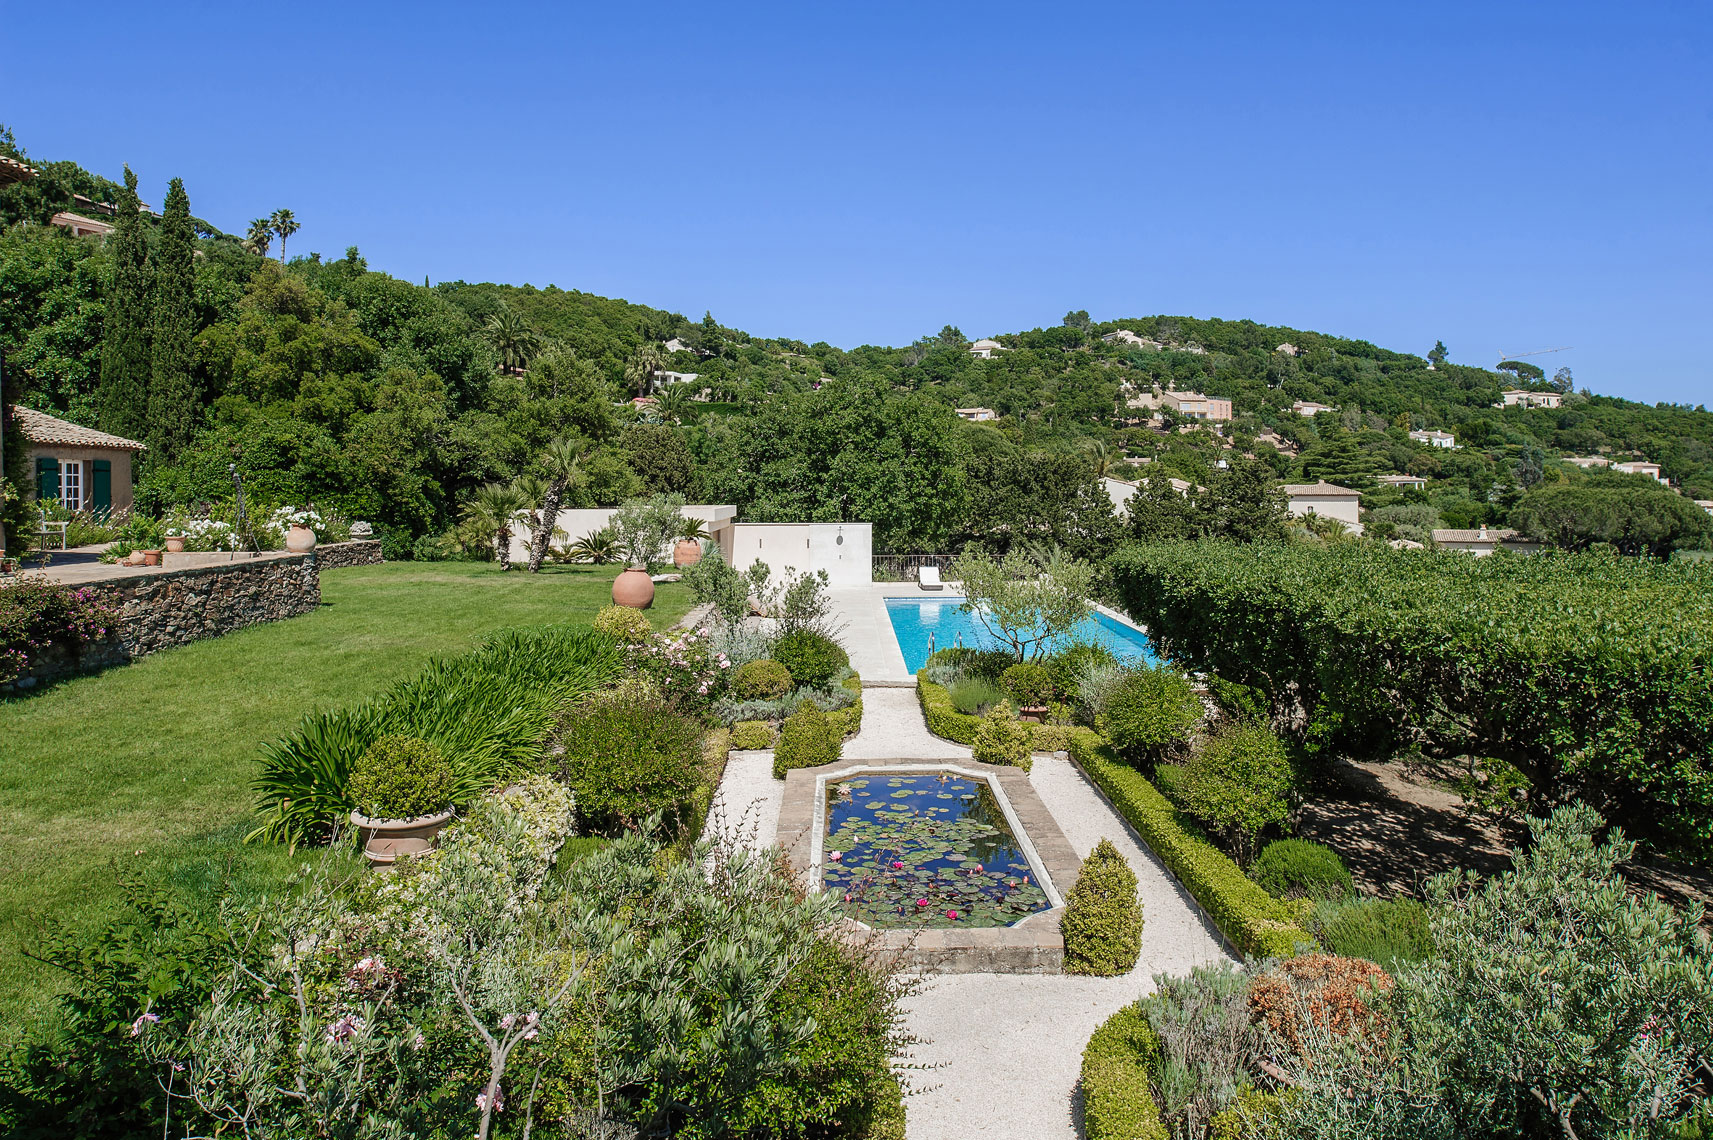 Villa-Turquoise---Victor-Perez-Architectural-Photographer-03.jpg